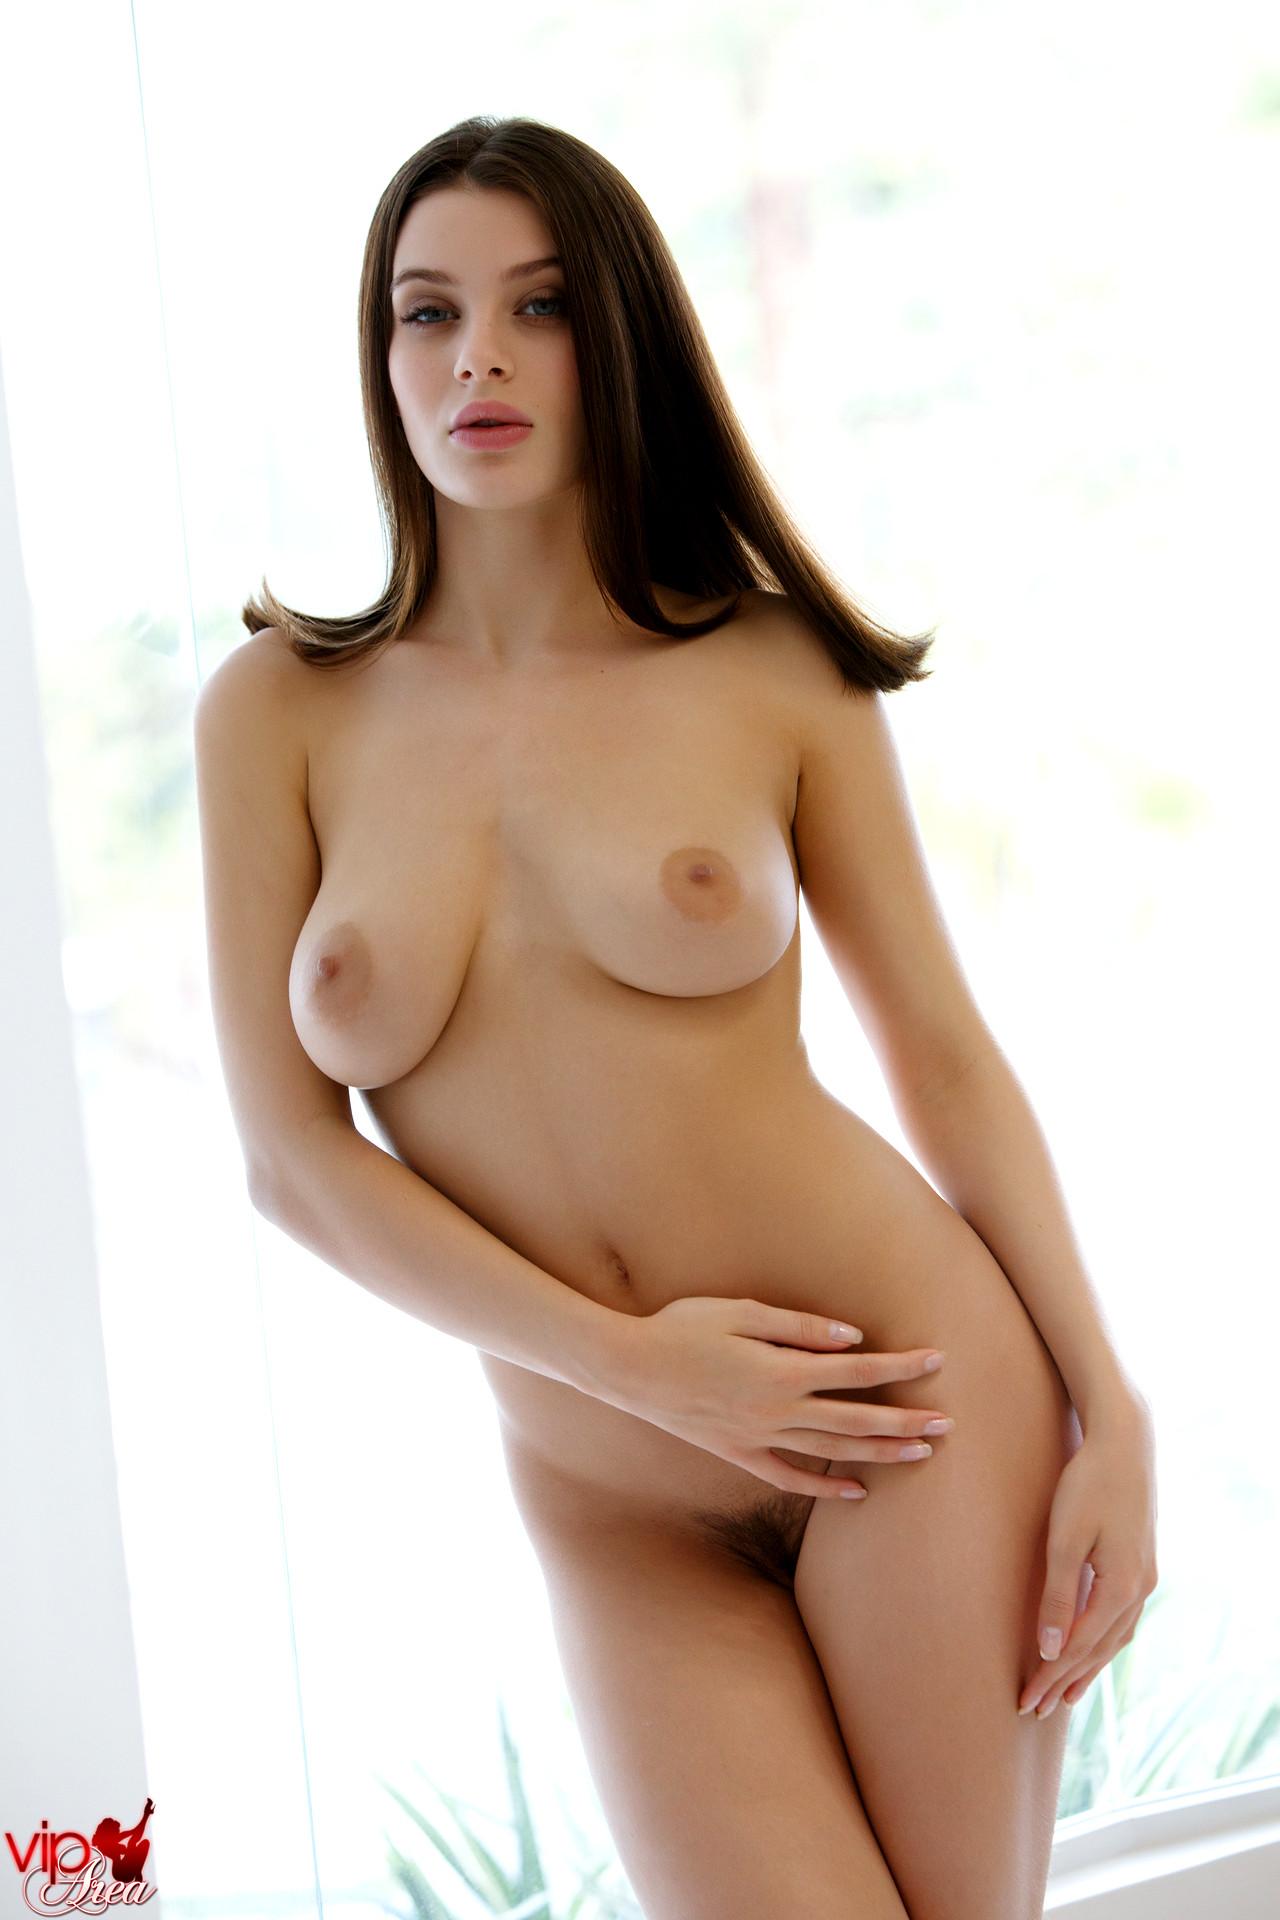 Lana rhoades new movies